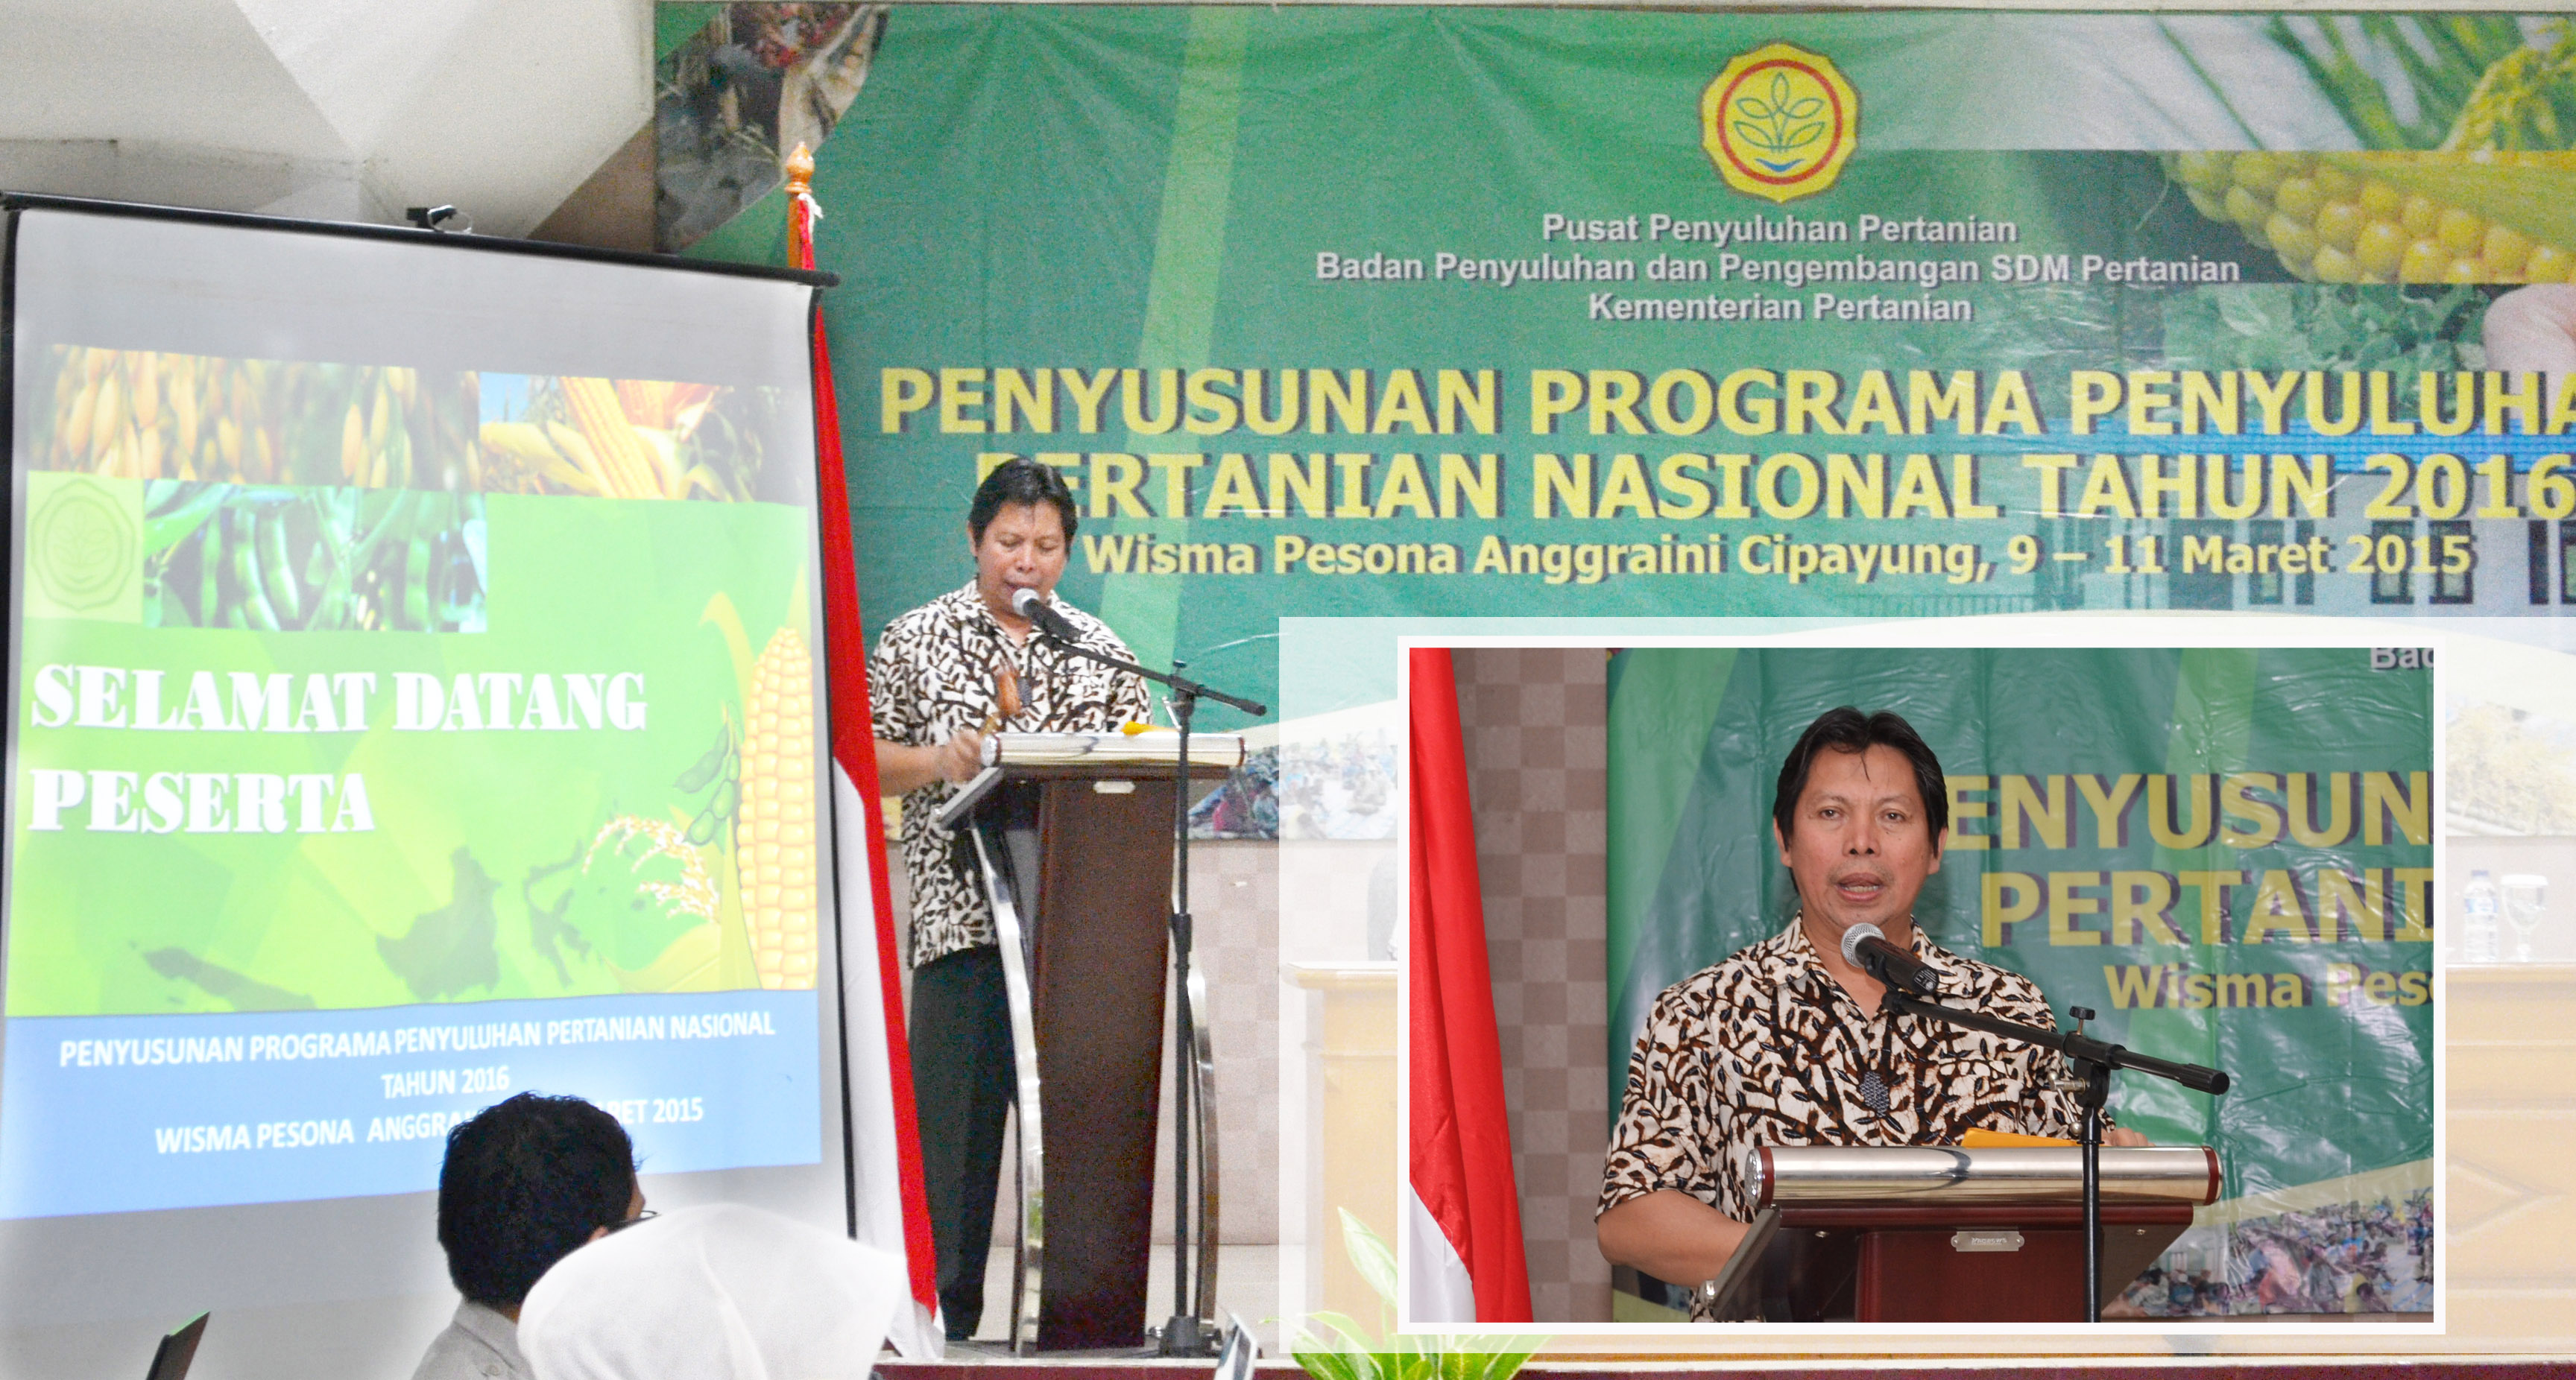 Pembukaan Penyusunan Programa Penyuluhan Pertanian Nasional tahun 2016